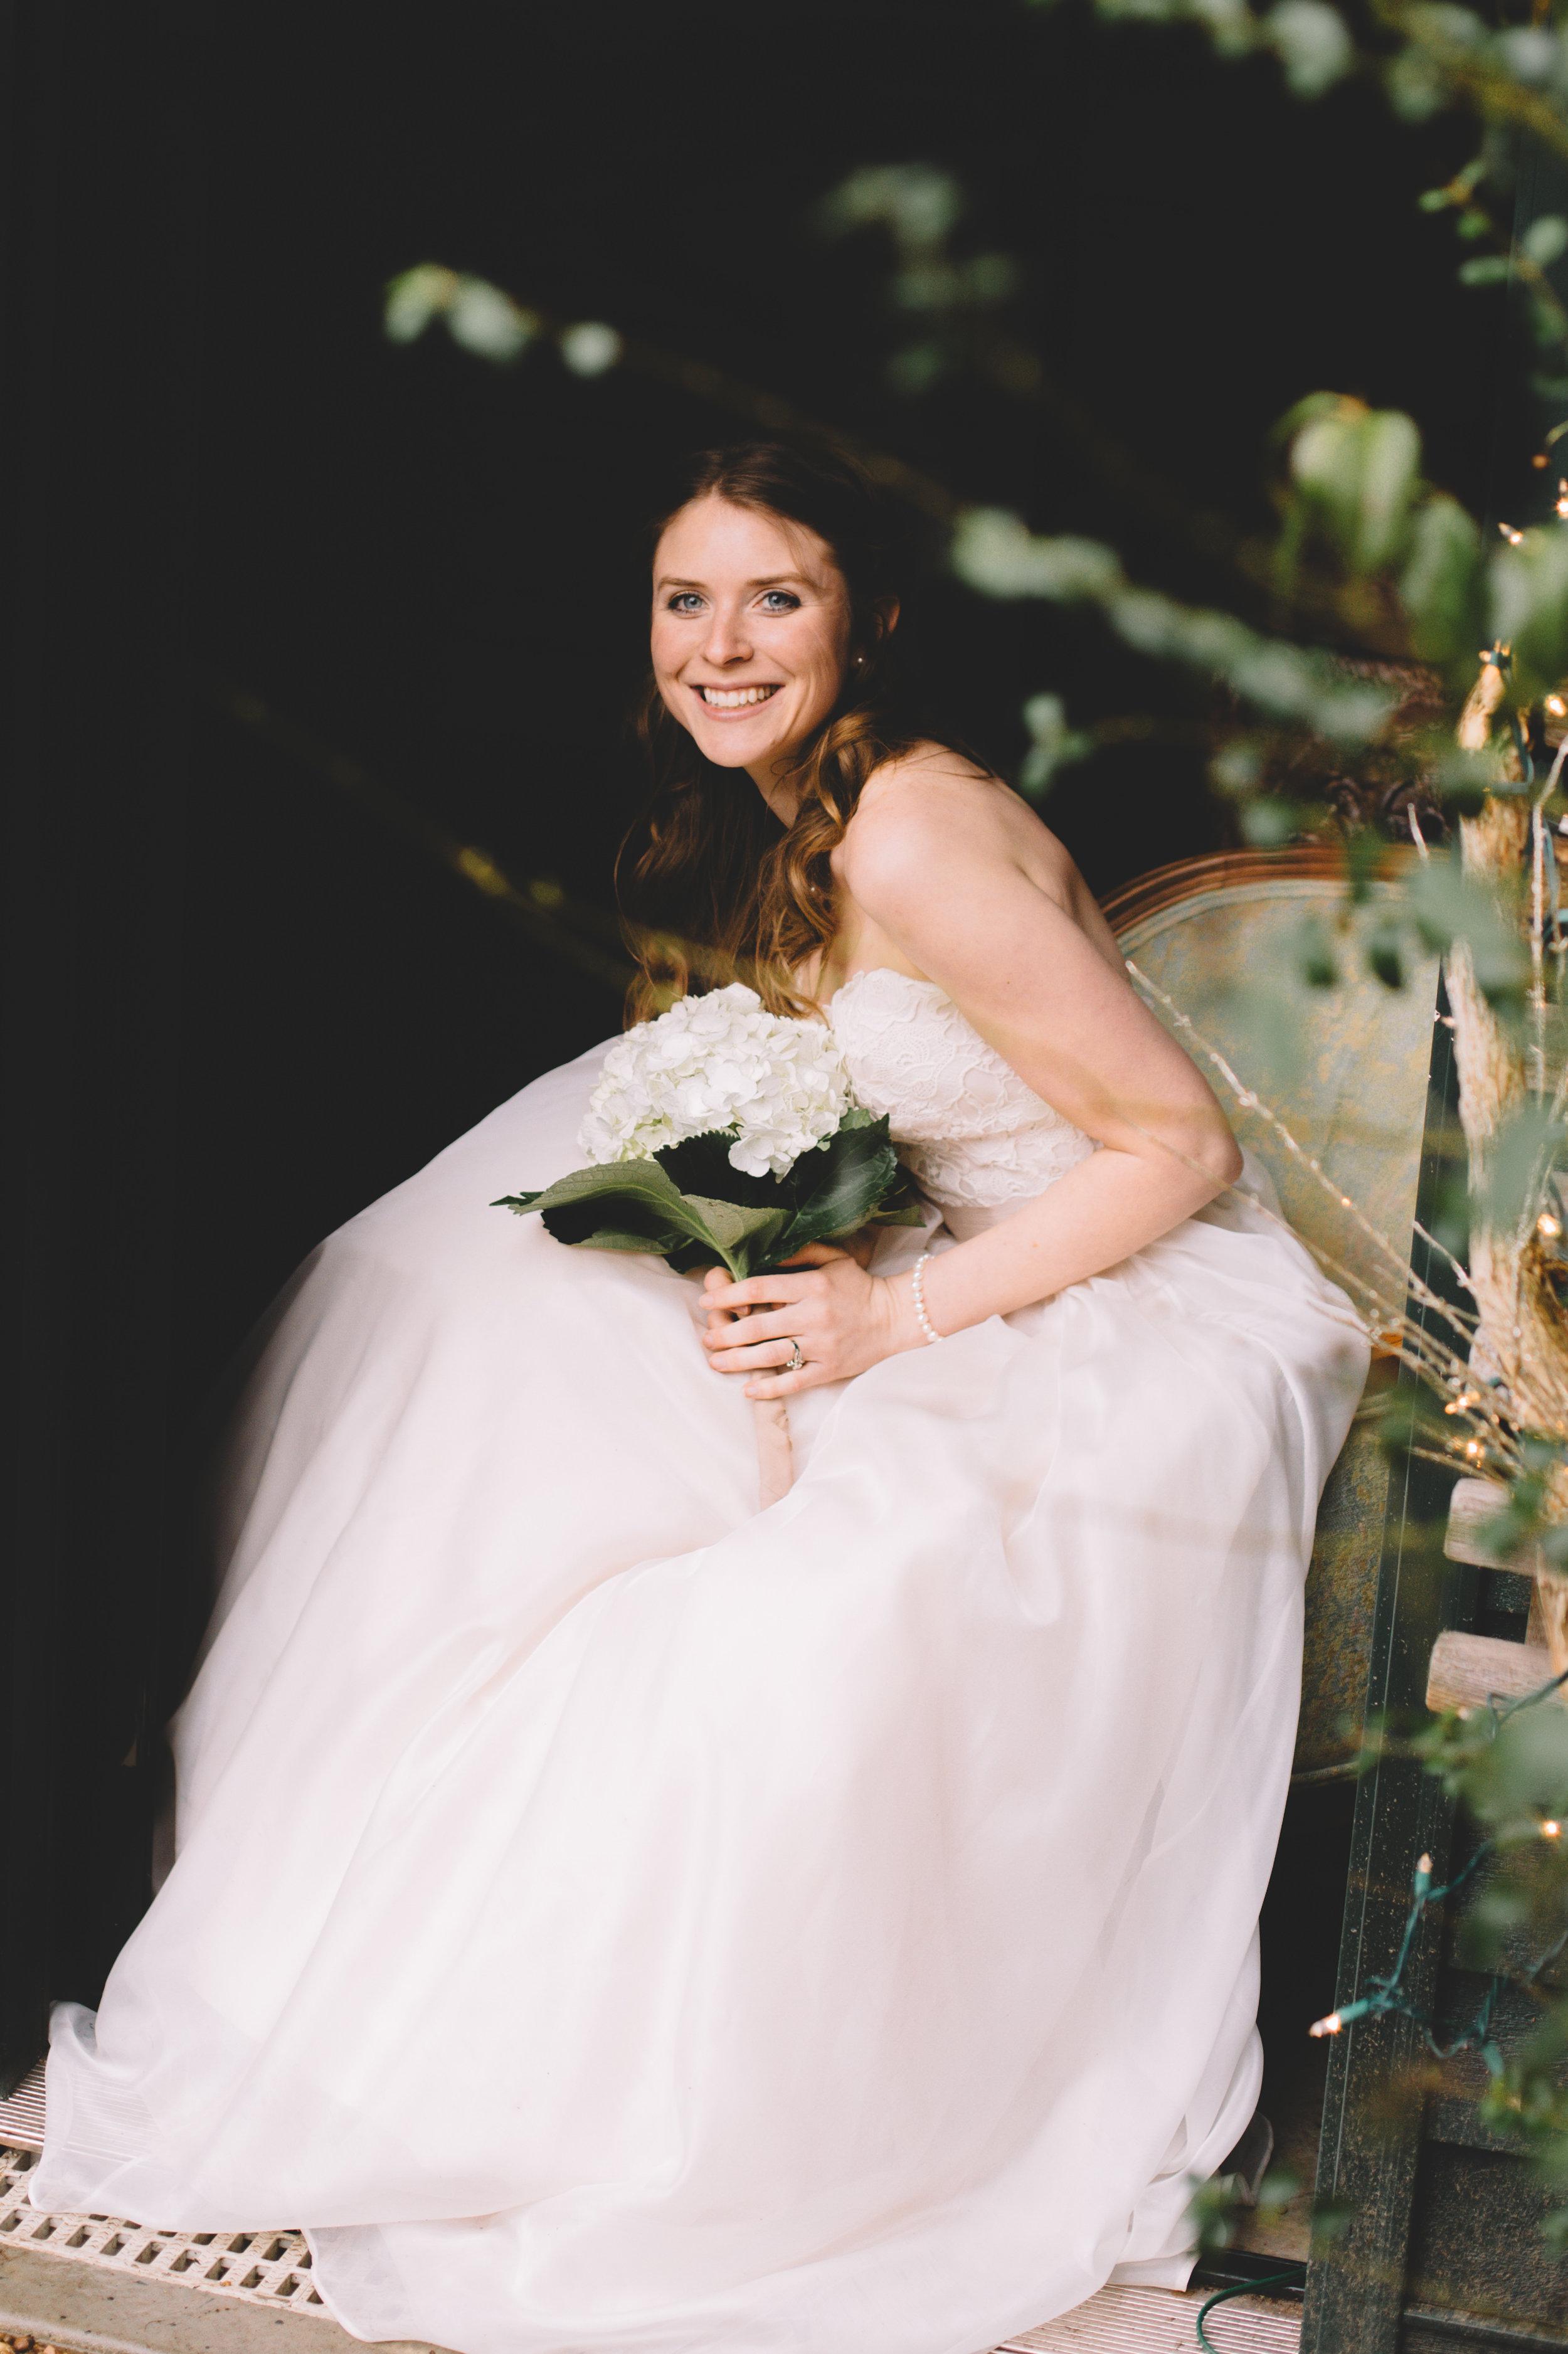 Jake + Brittney Balbas Airbnb Carriage House Wedding Evansville IN (140 of 426).jpg